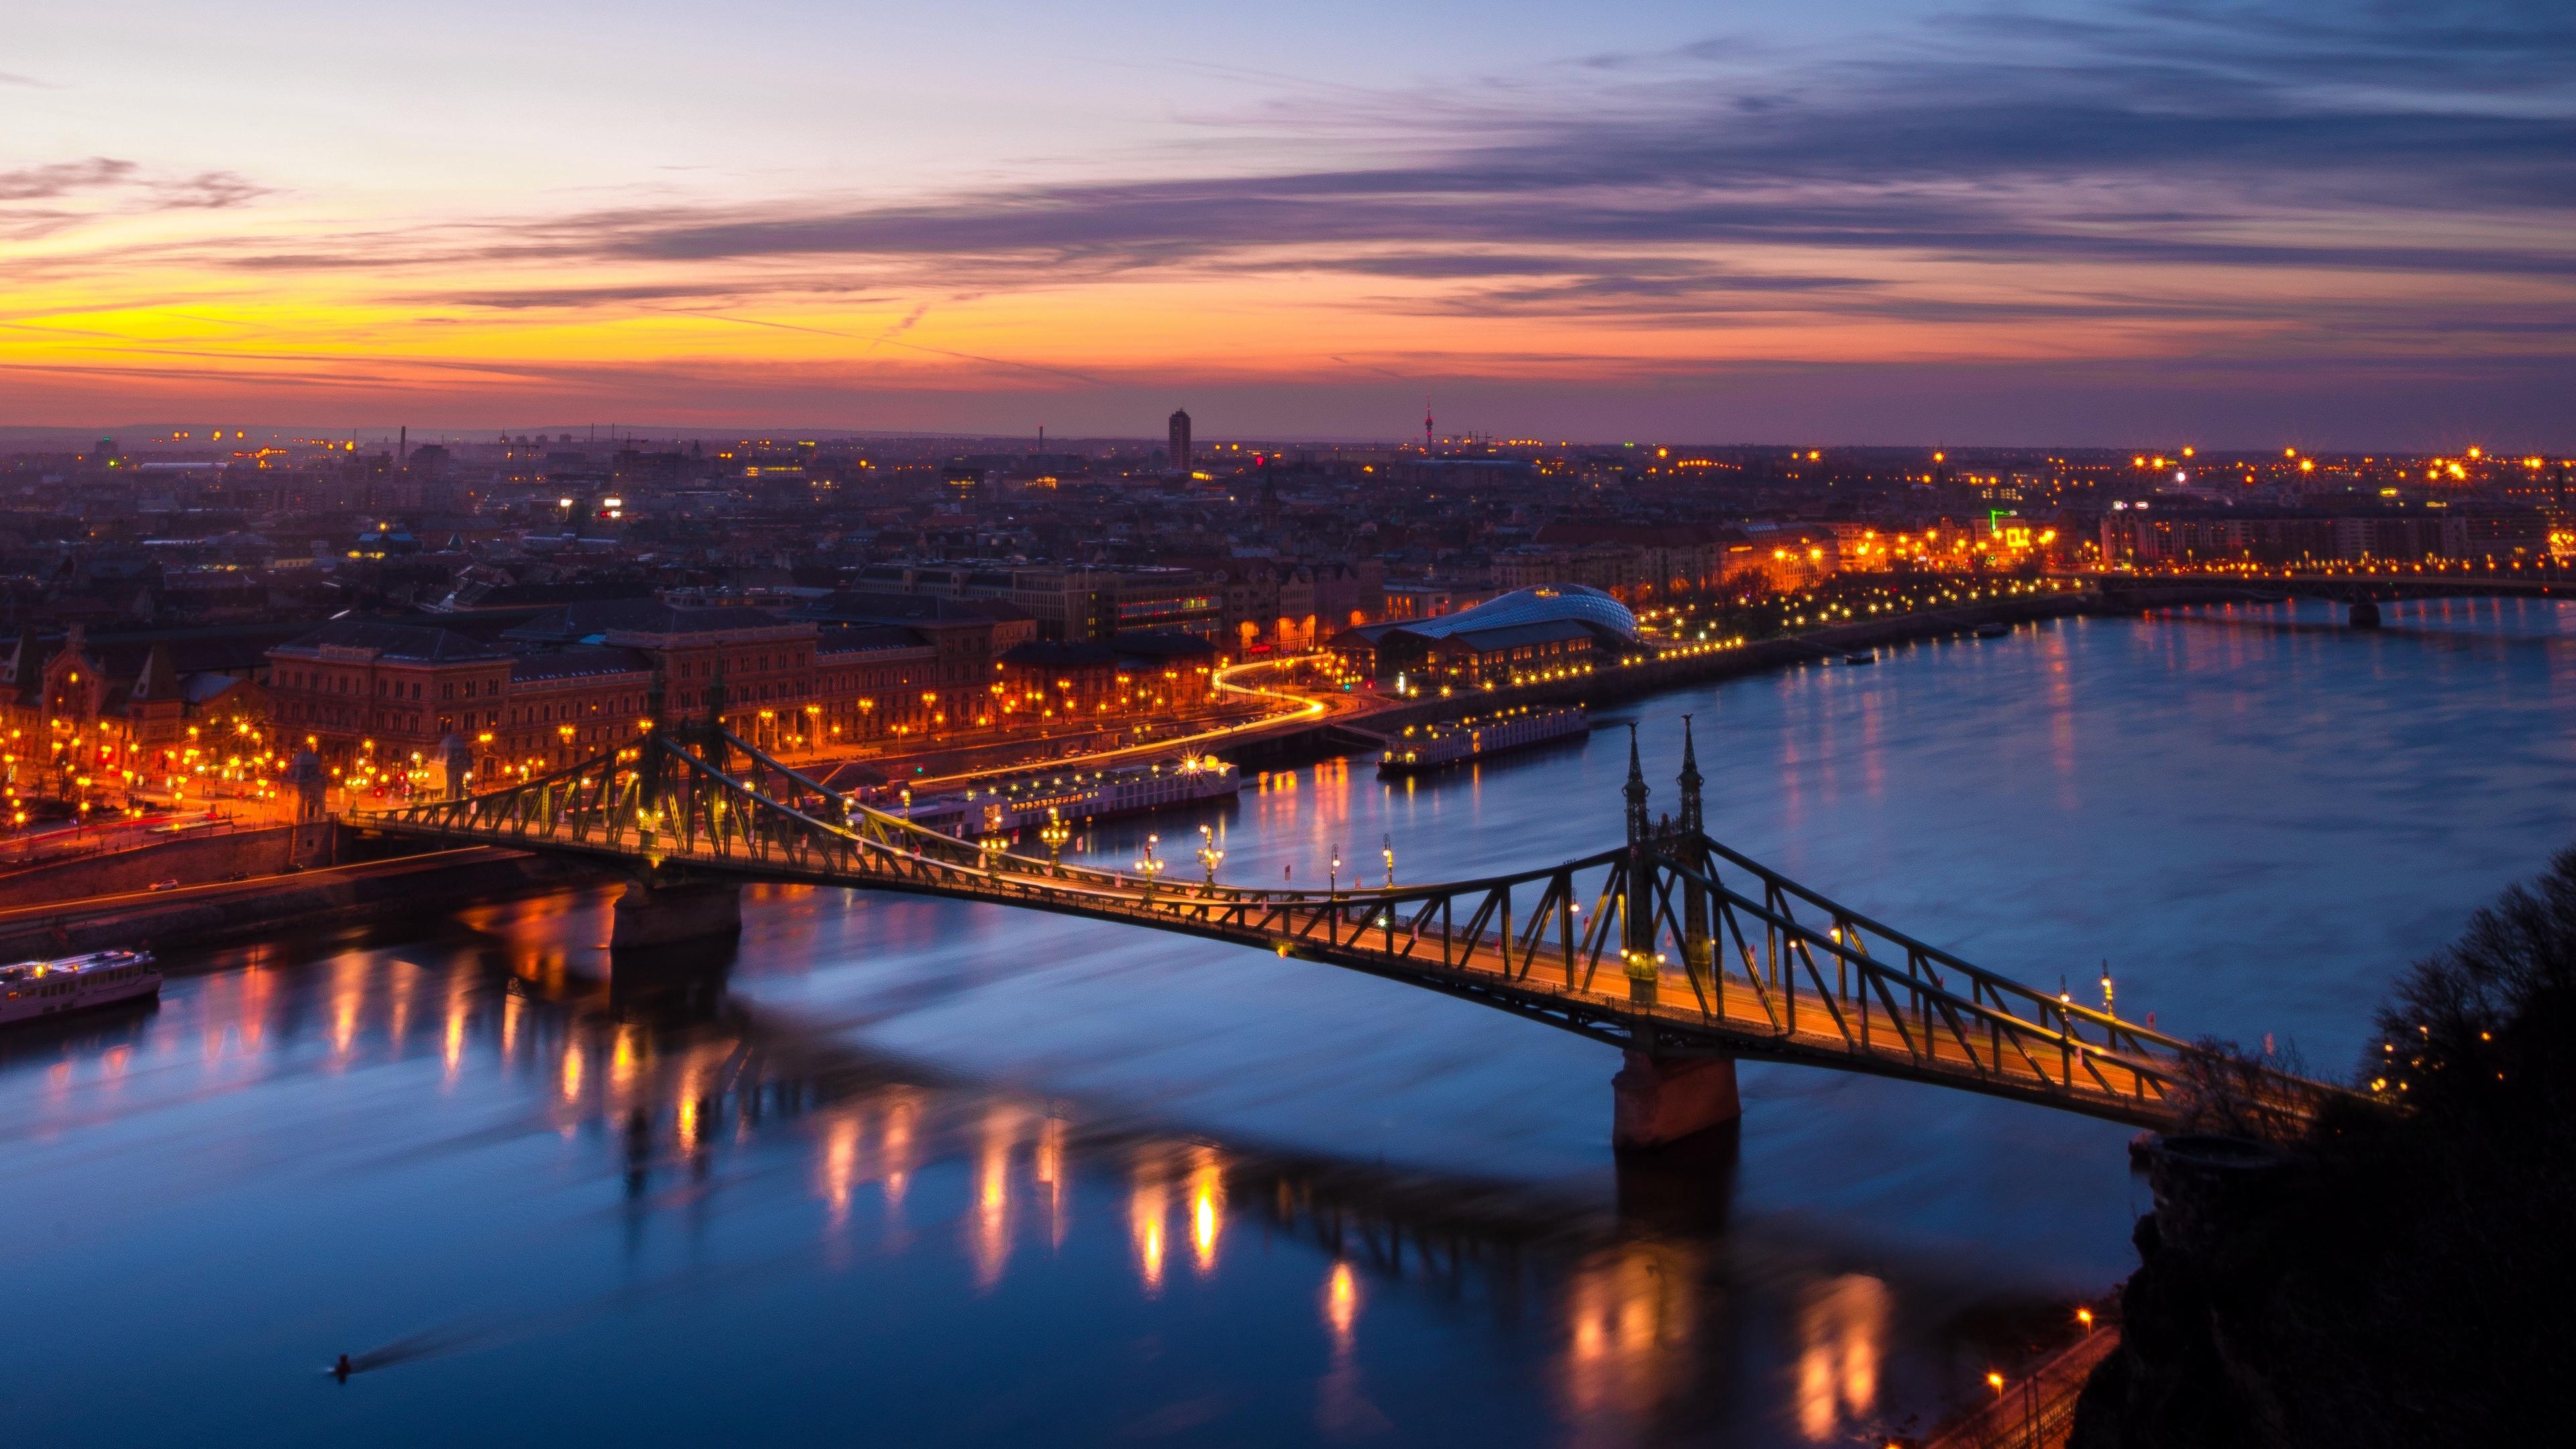 budapest hungary night city bridge 4k 1538066039 - budapest, hungary, night city, bridge 4k - night city, hungary, Budapest